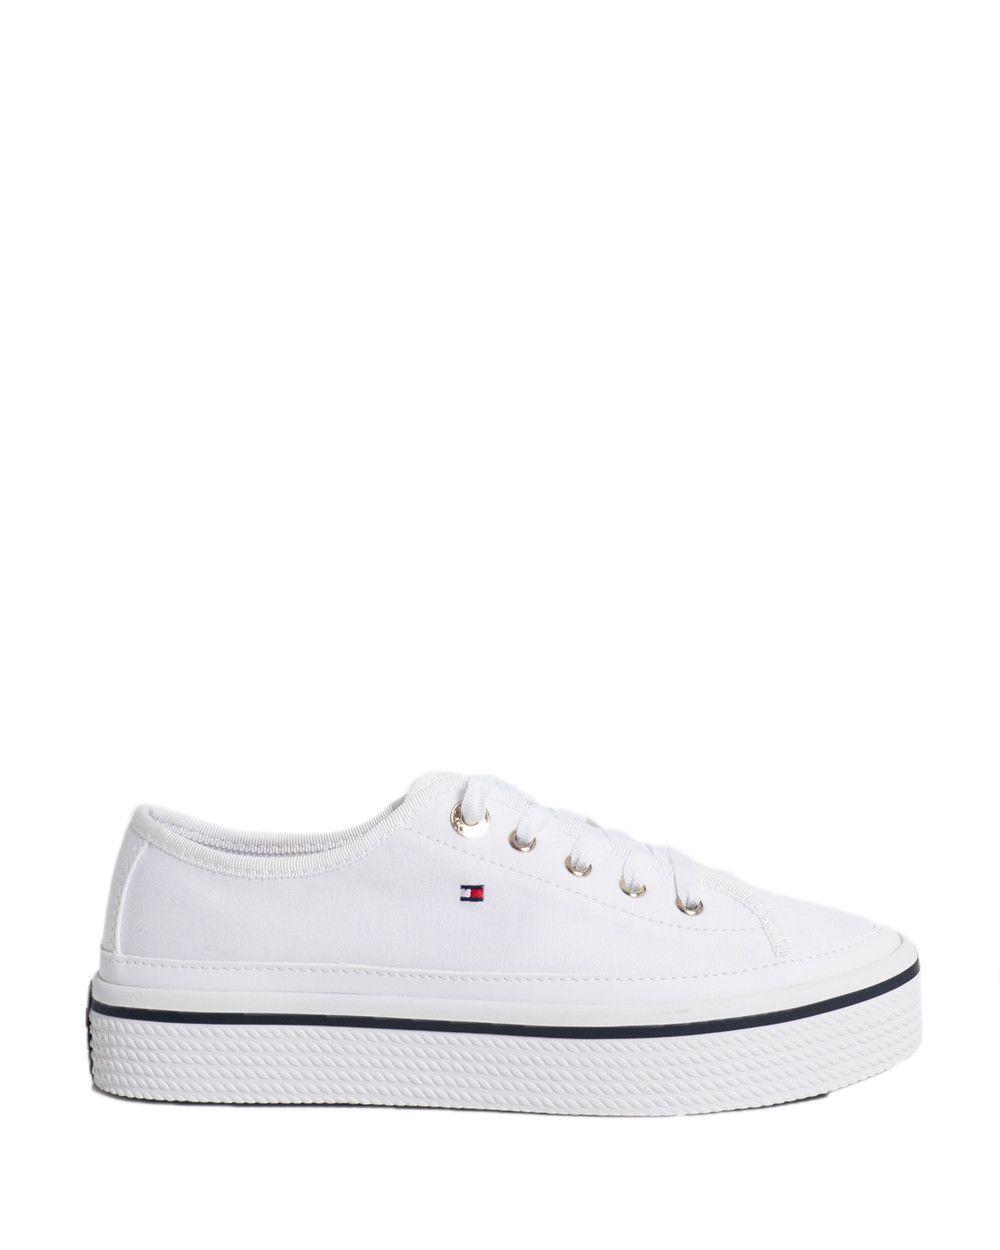 Tommy Hilfiger Women's Sneakers In White